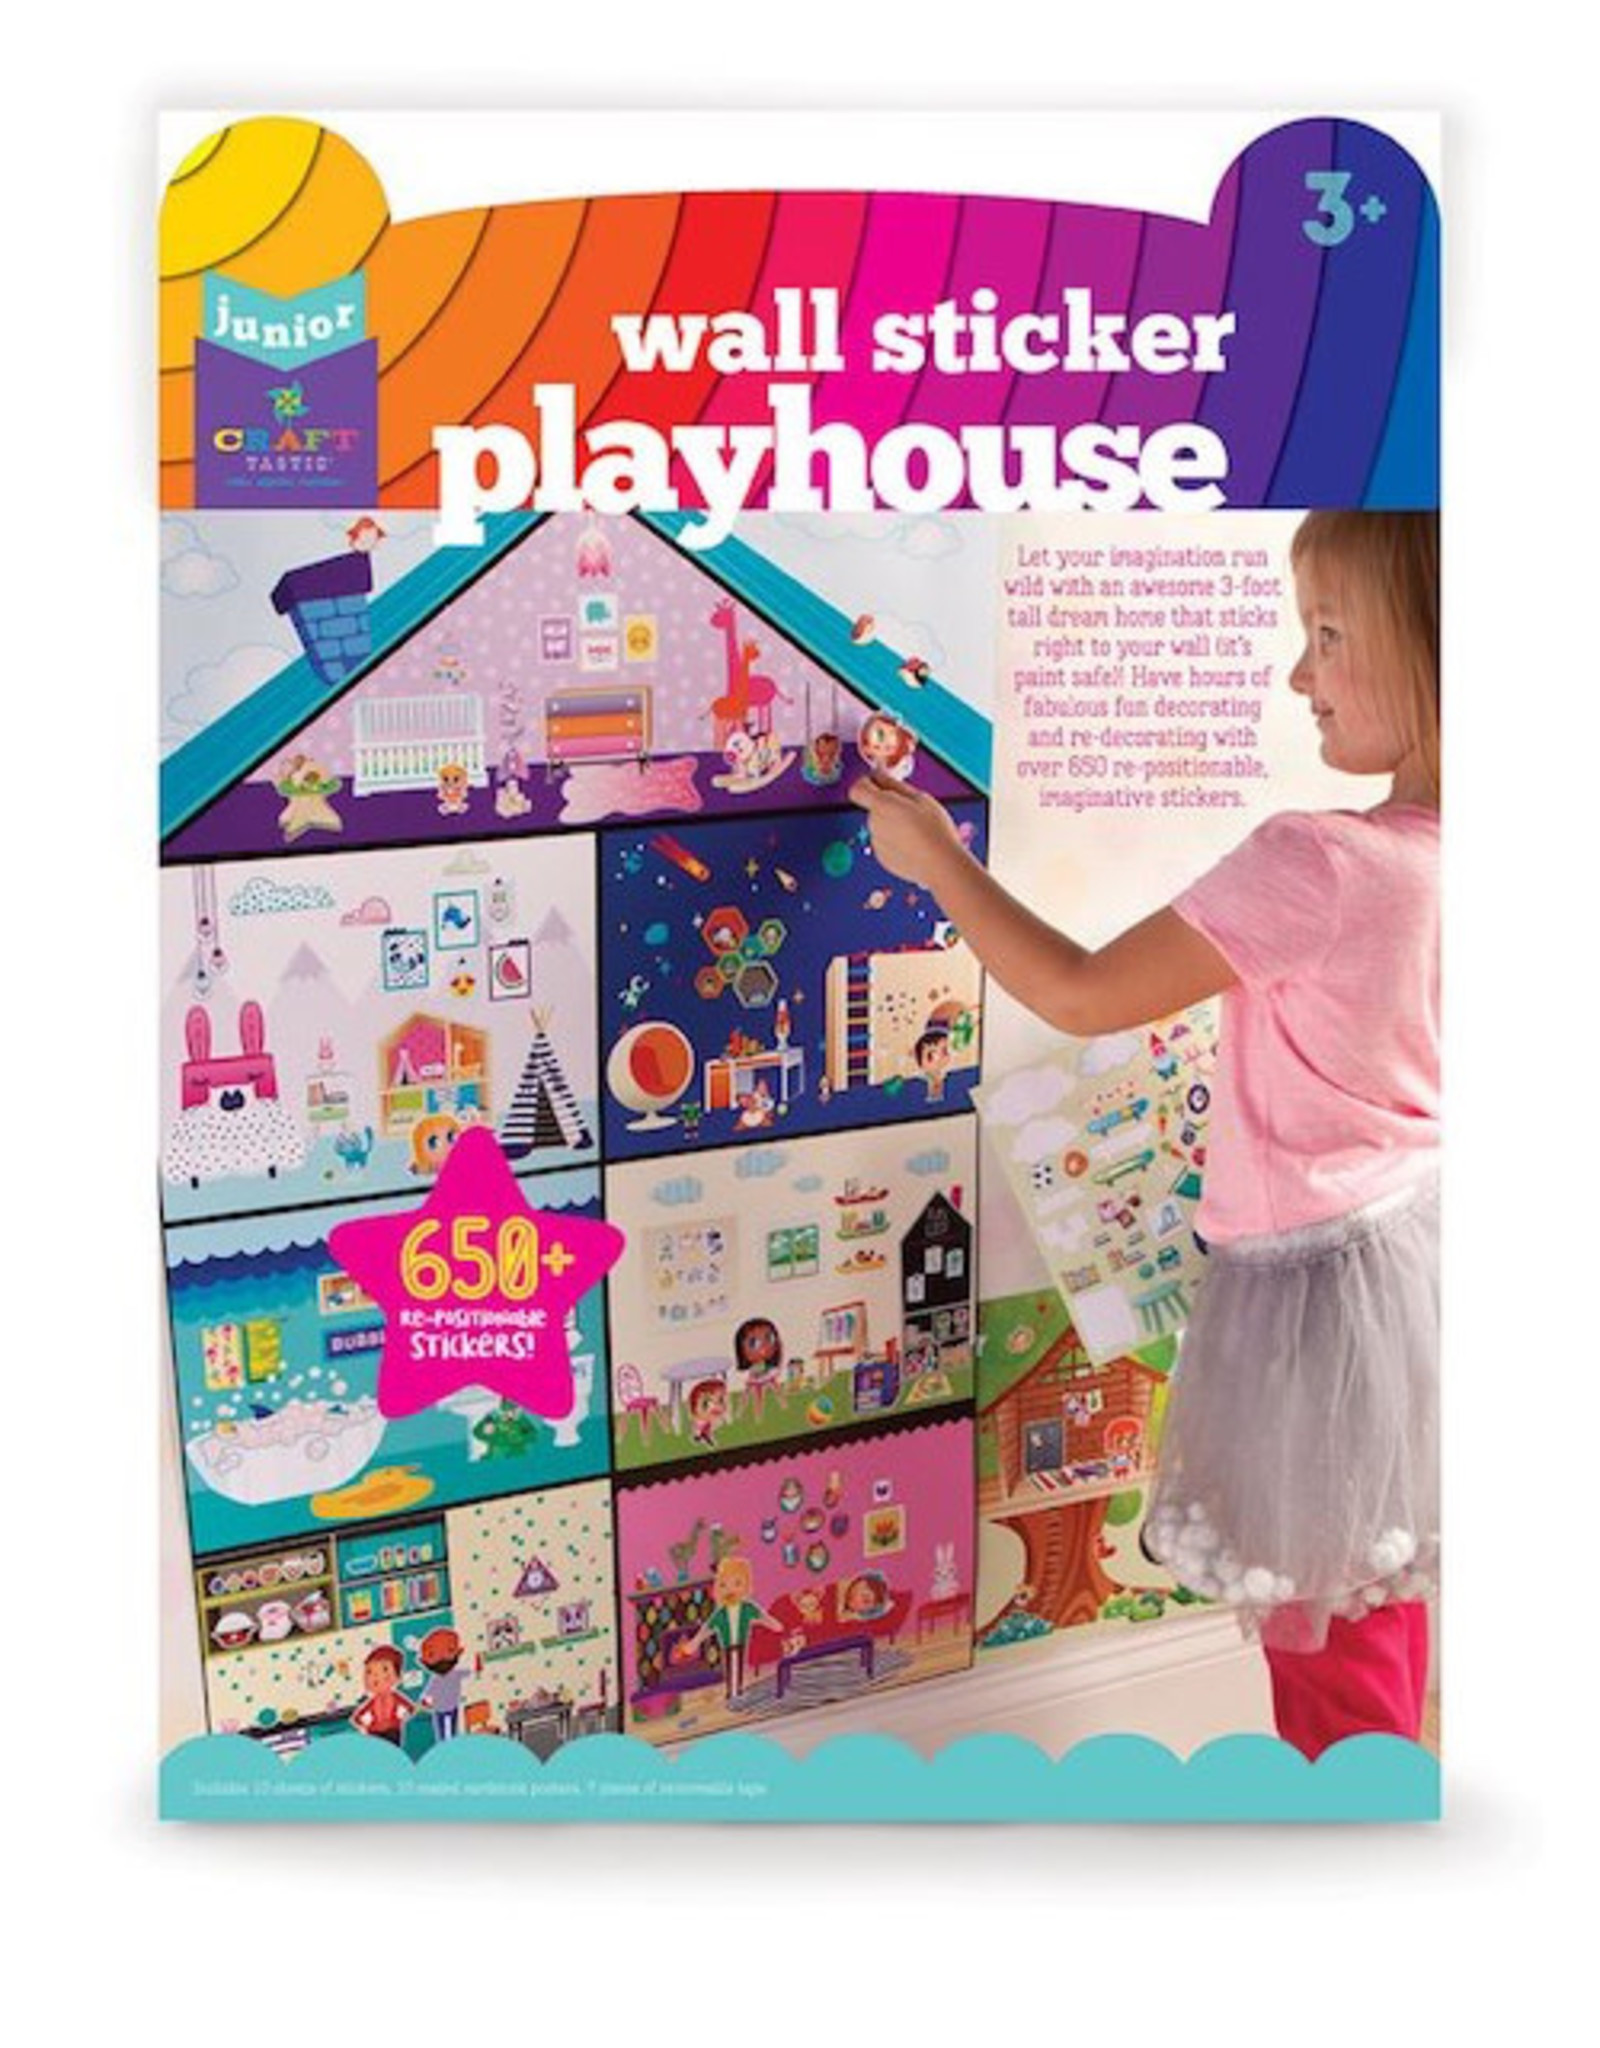 Craft-tastic Jr Wall Sticker Playhouse